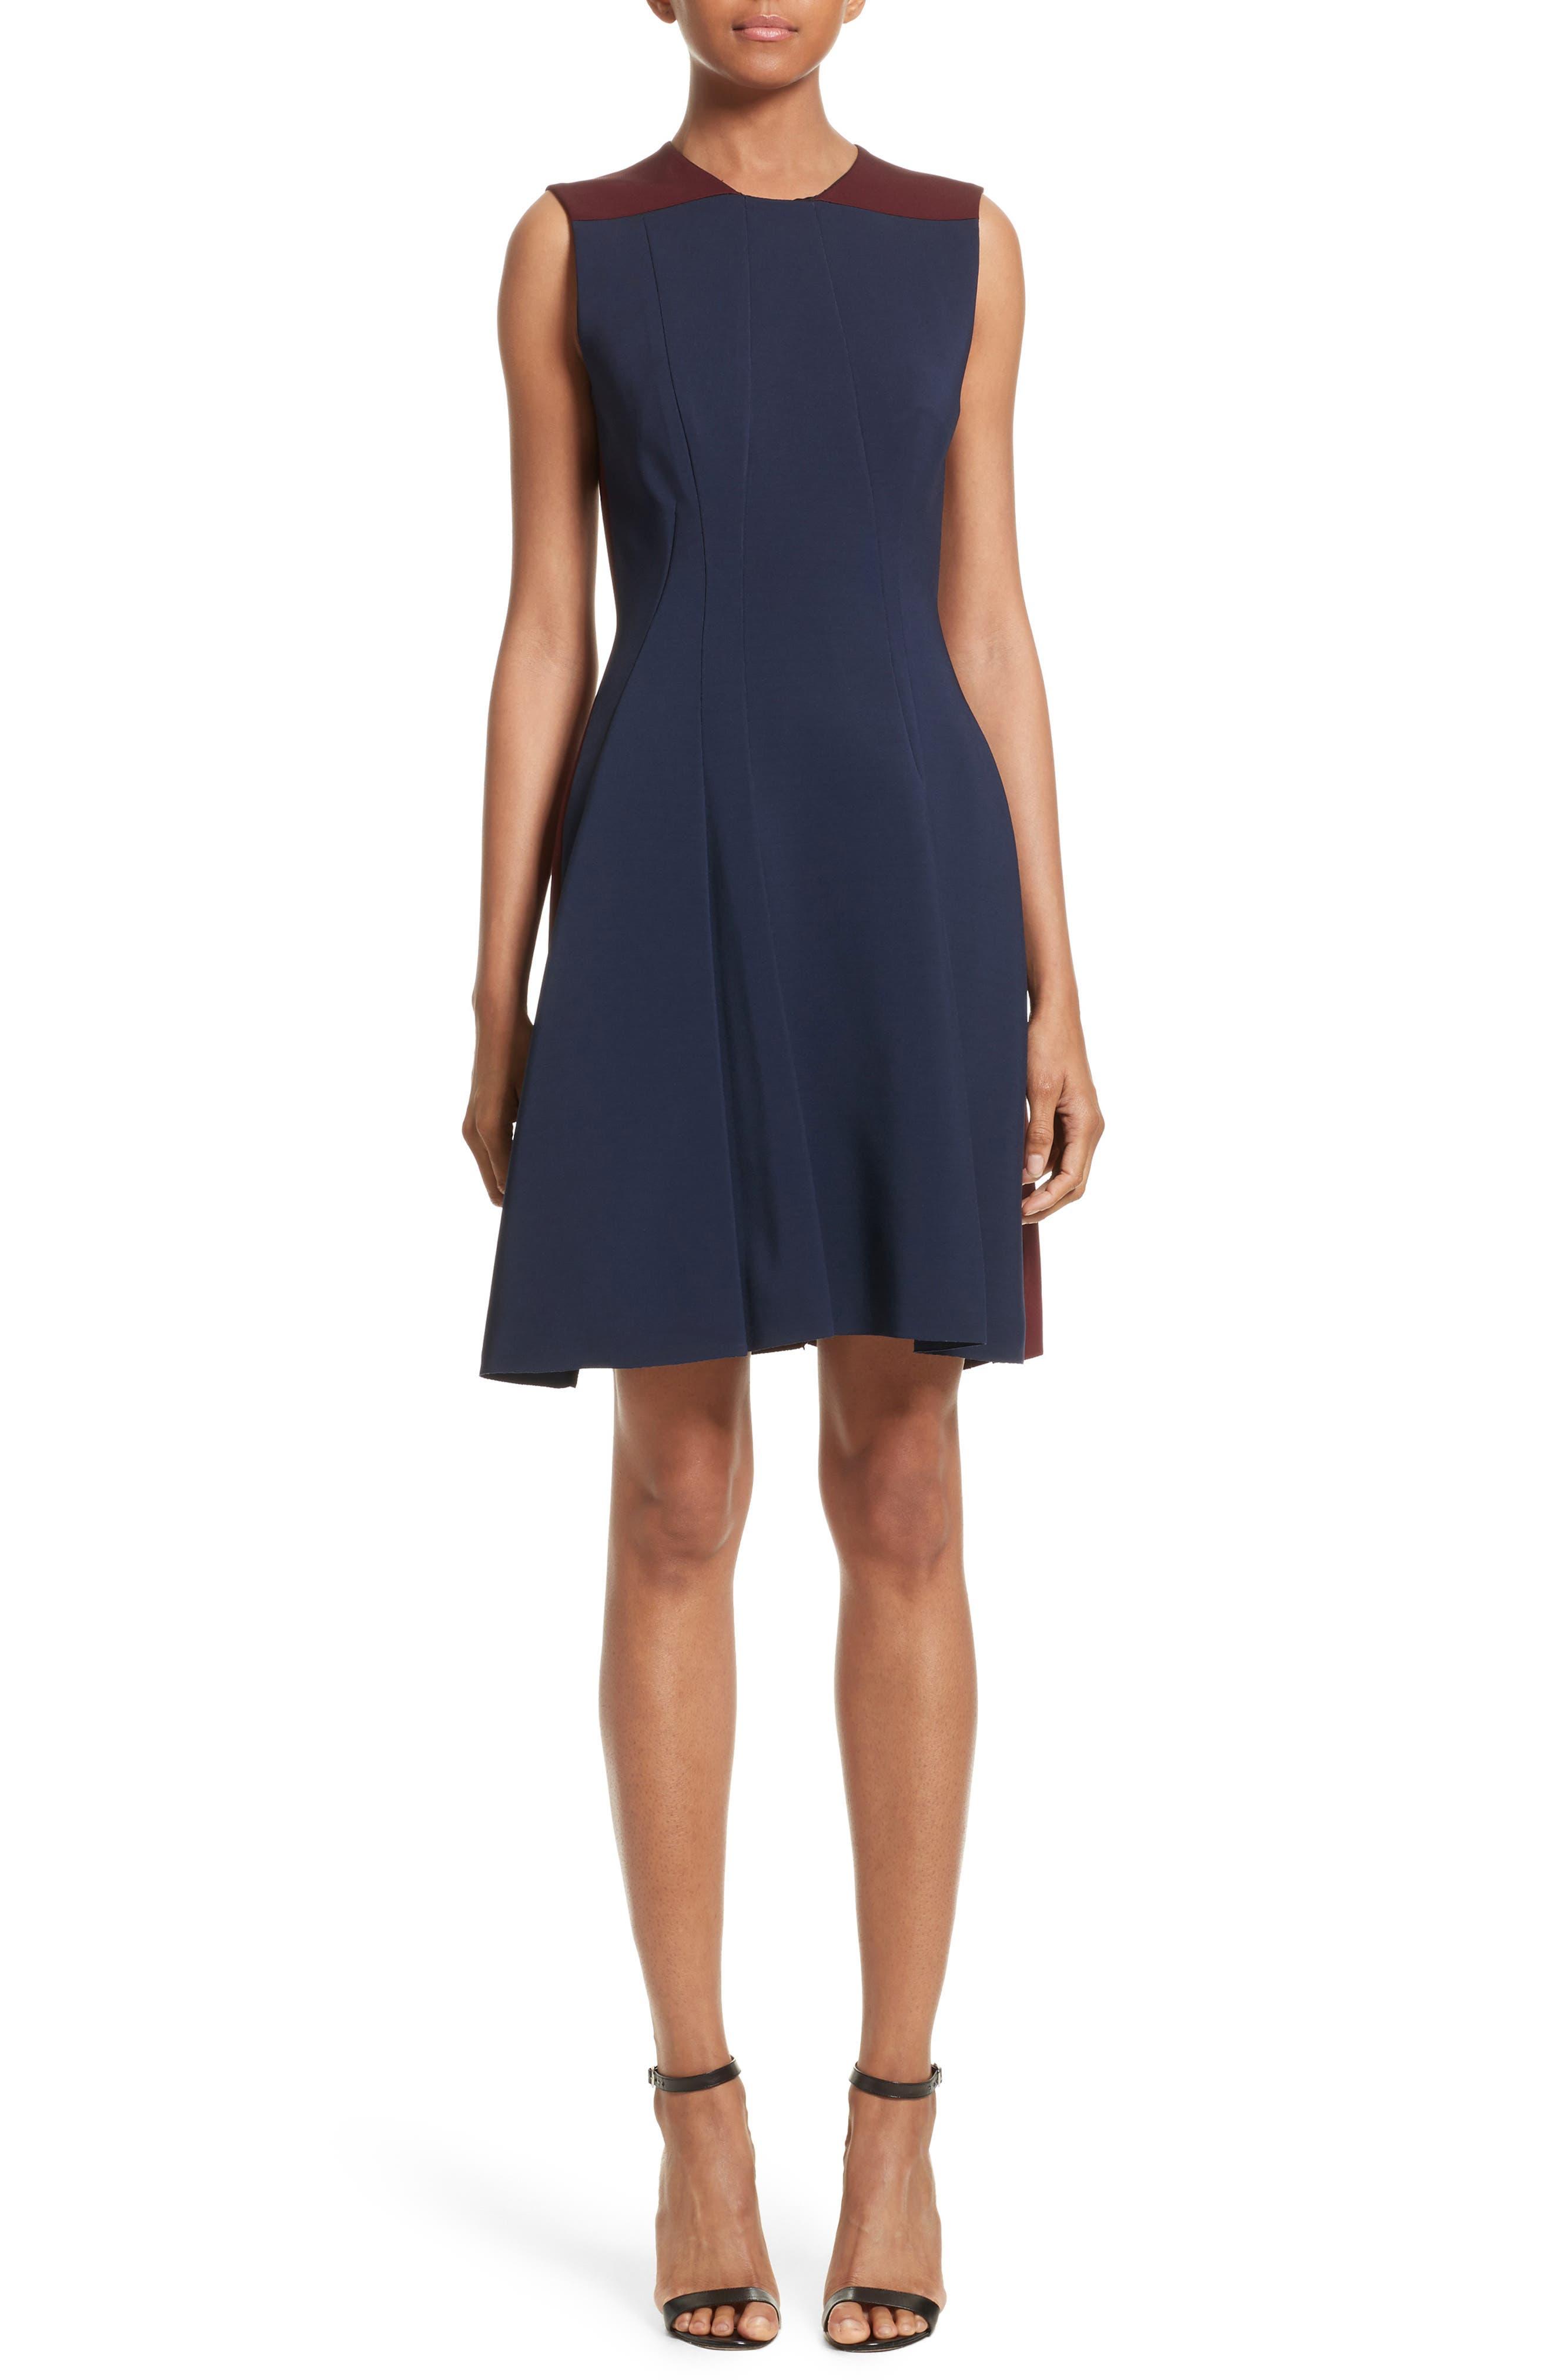 Main Image - Victoria Beckham Colorblock Fit & Flare Dress